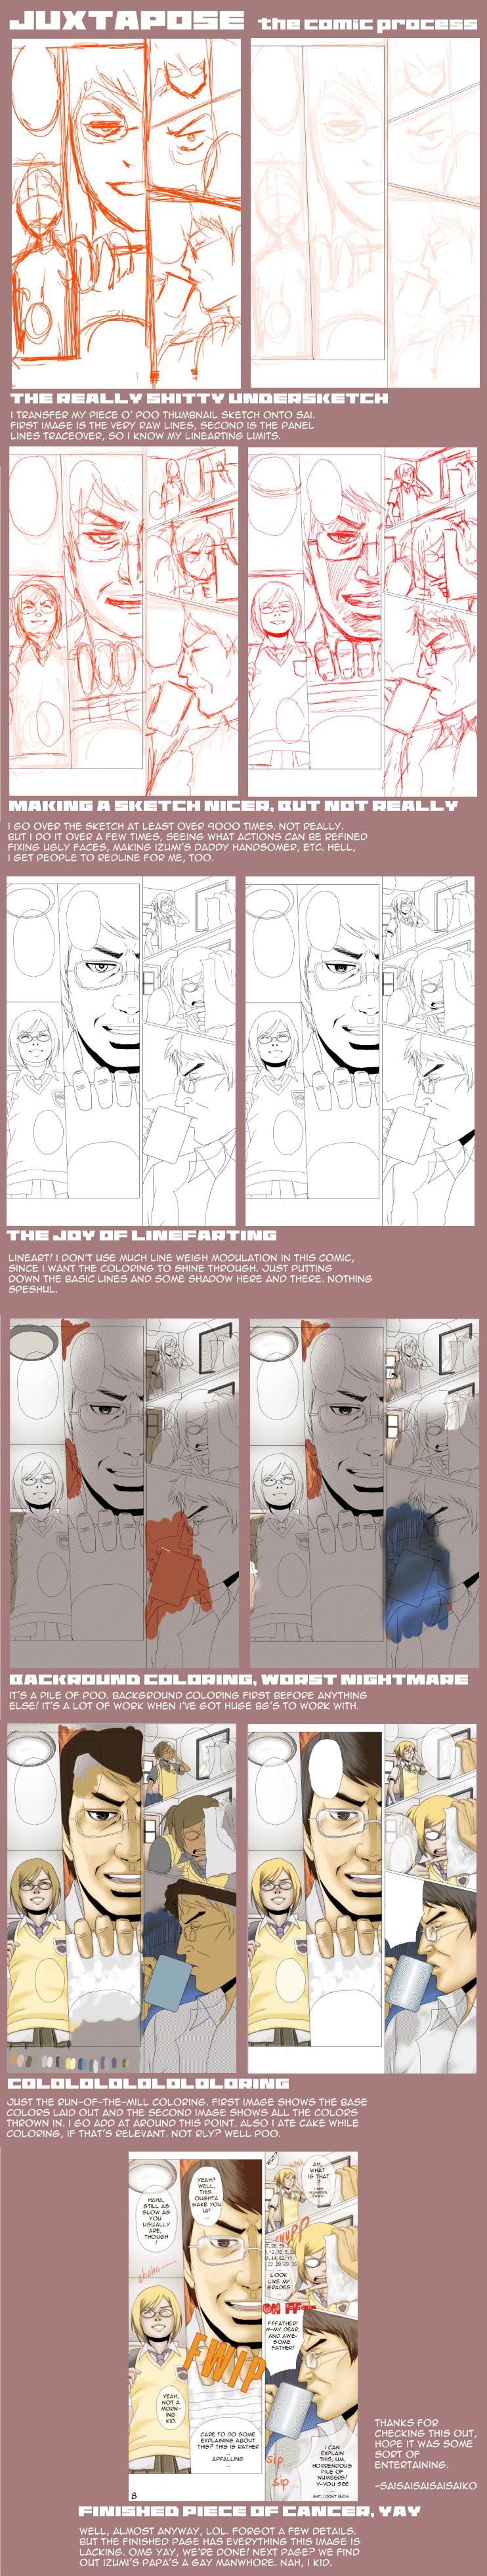 Saiko's Comicking Process by Saiko-chan